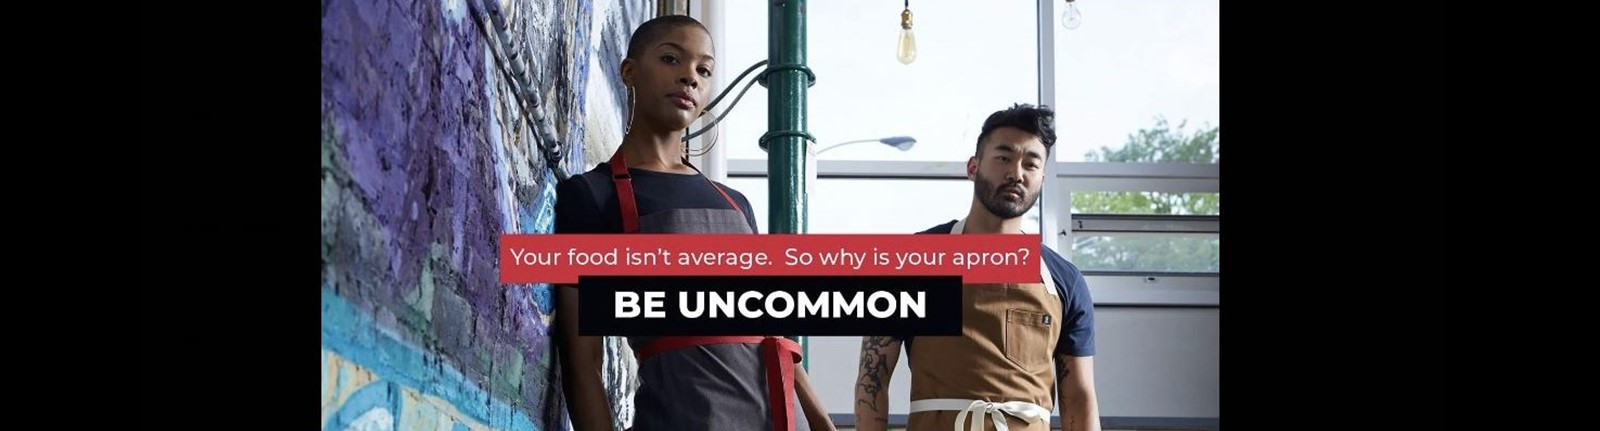 uncommonthreads220148.jpg